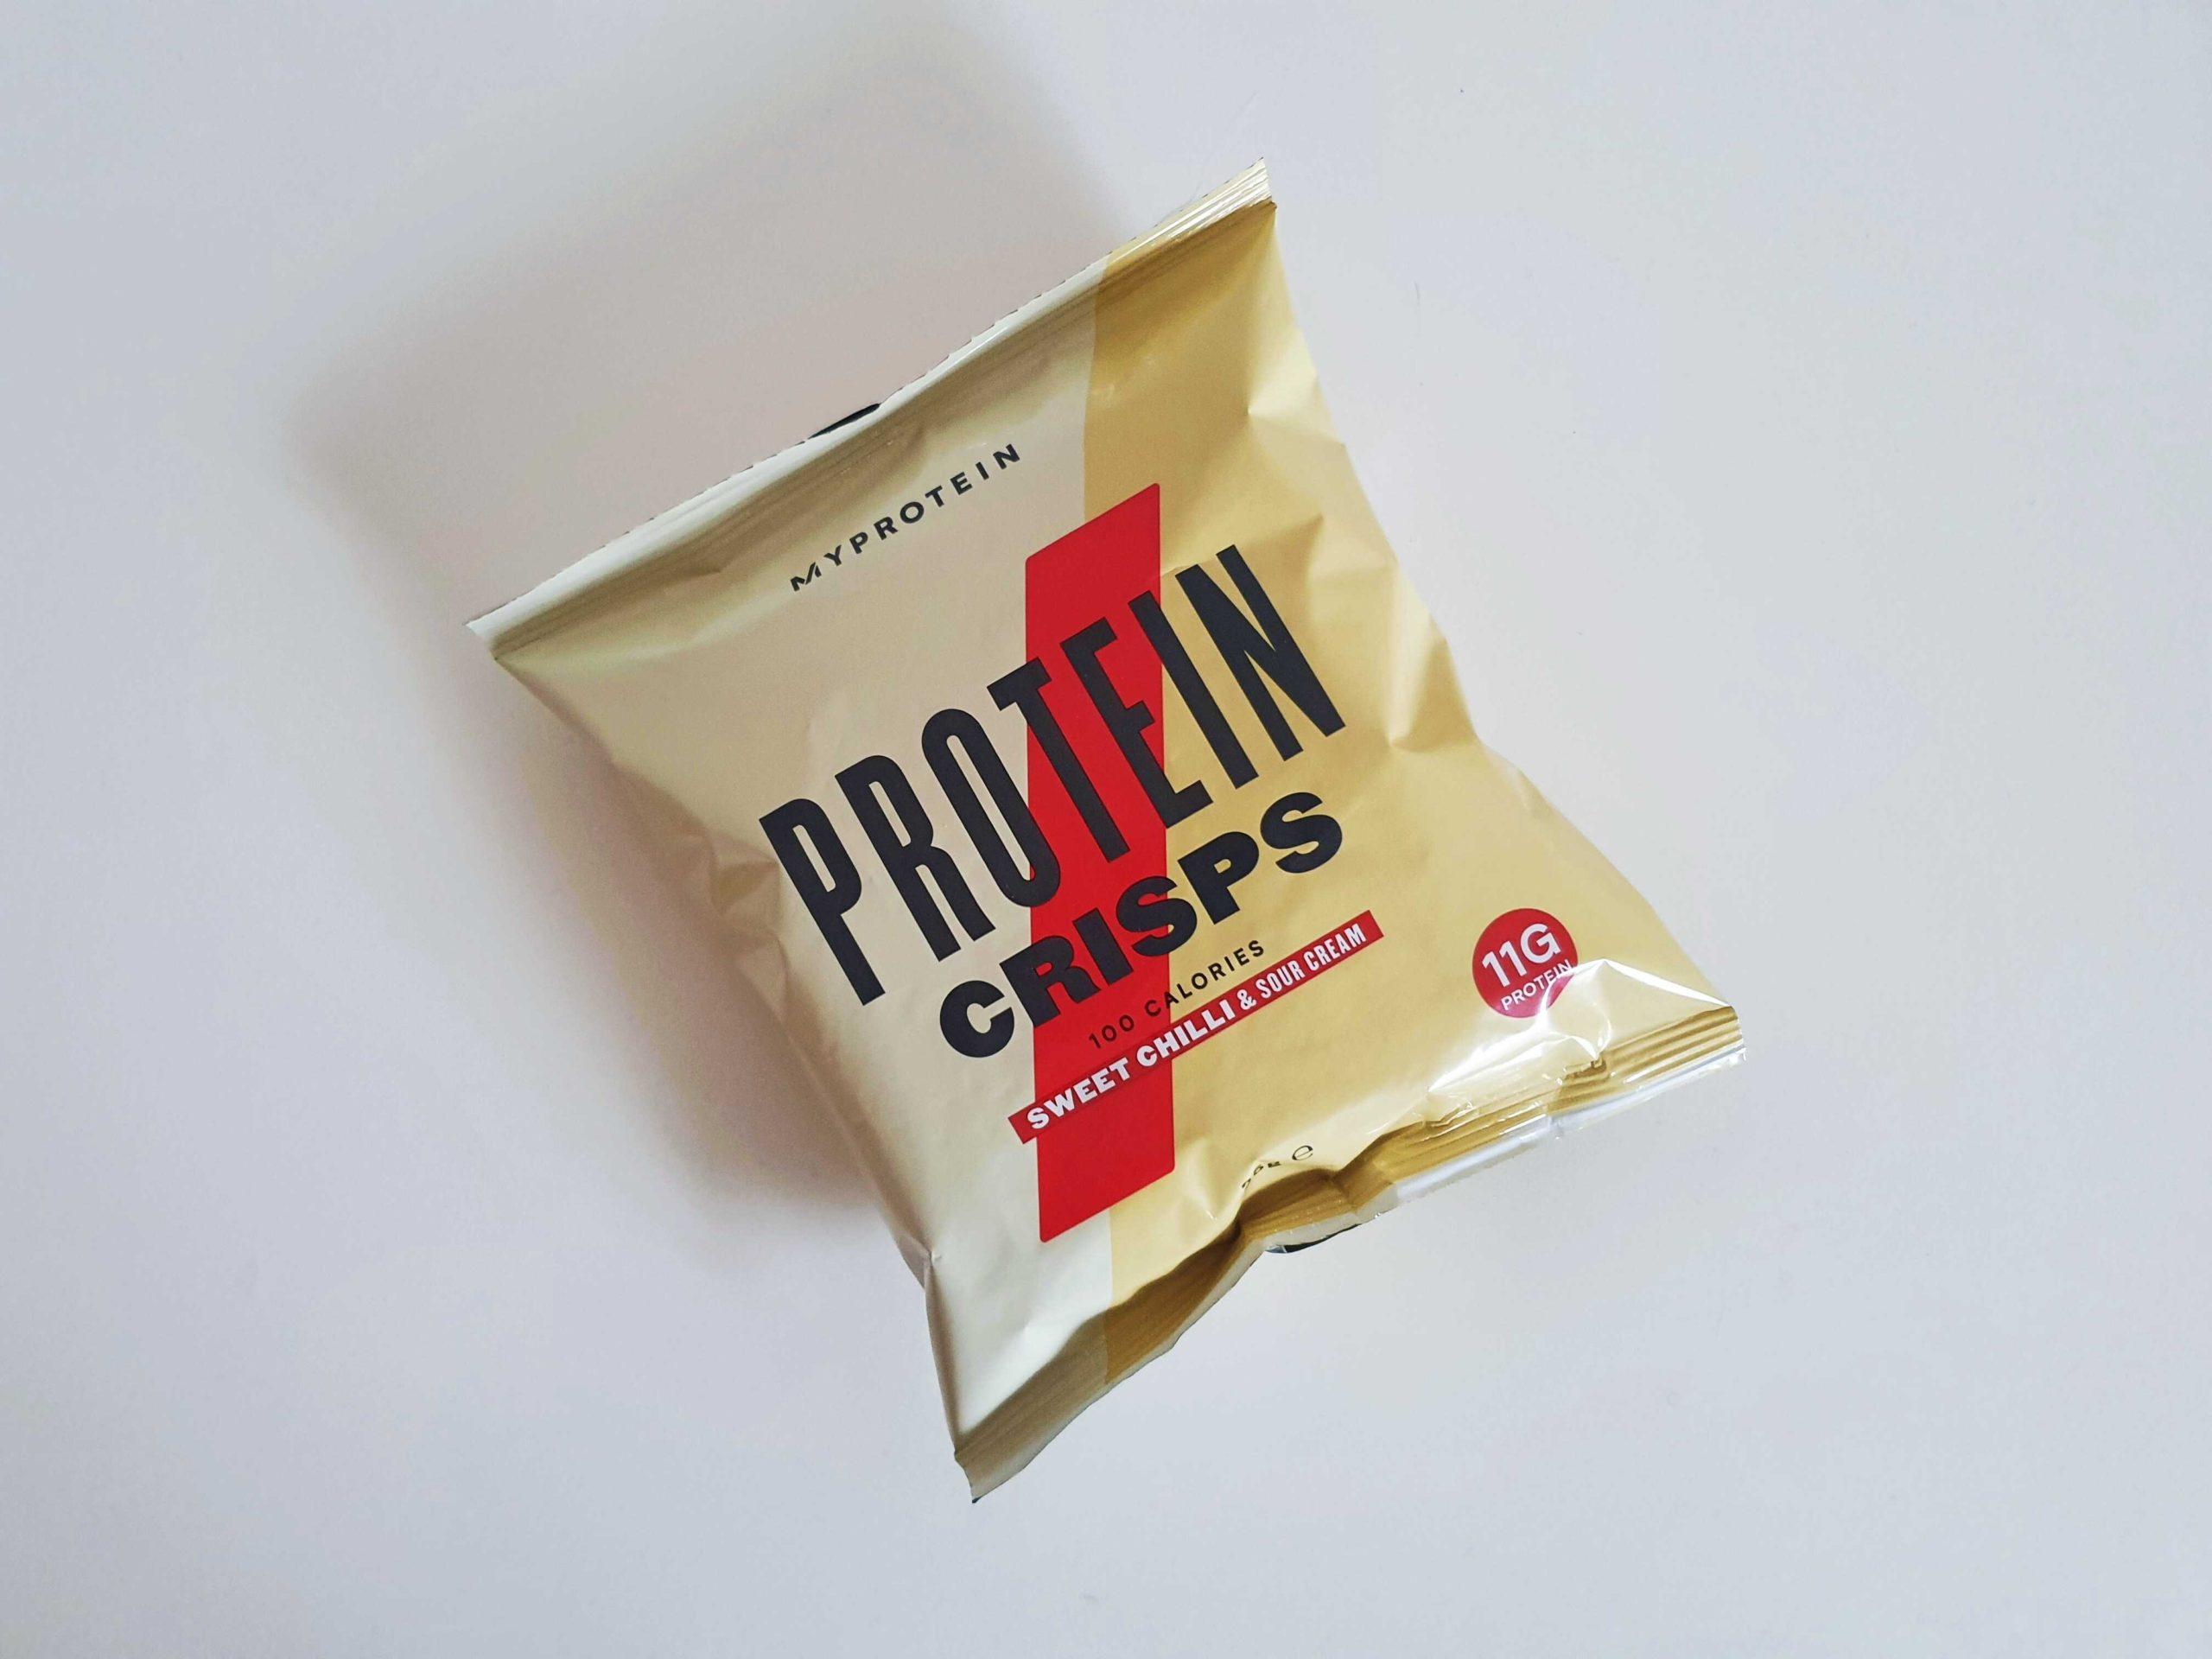 Proteinové chipsy MyProtein s vysokým obsahem bílkovin